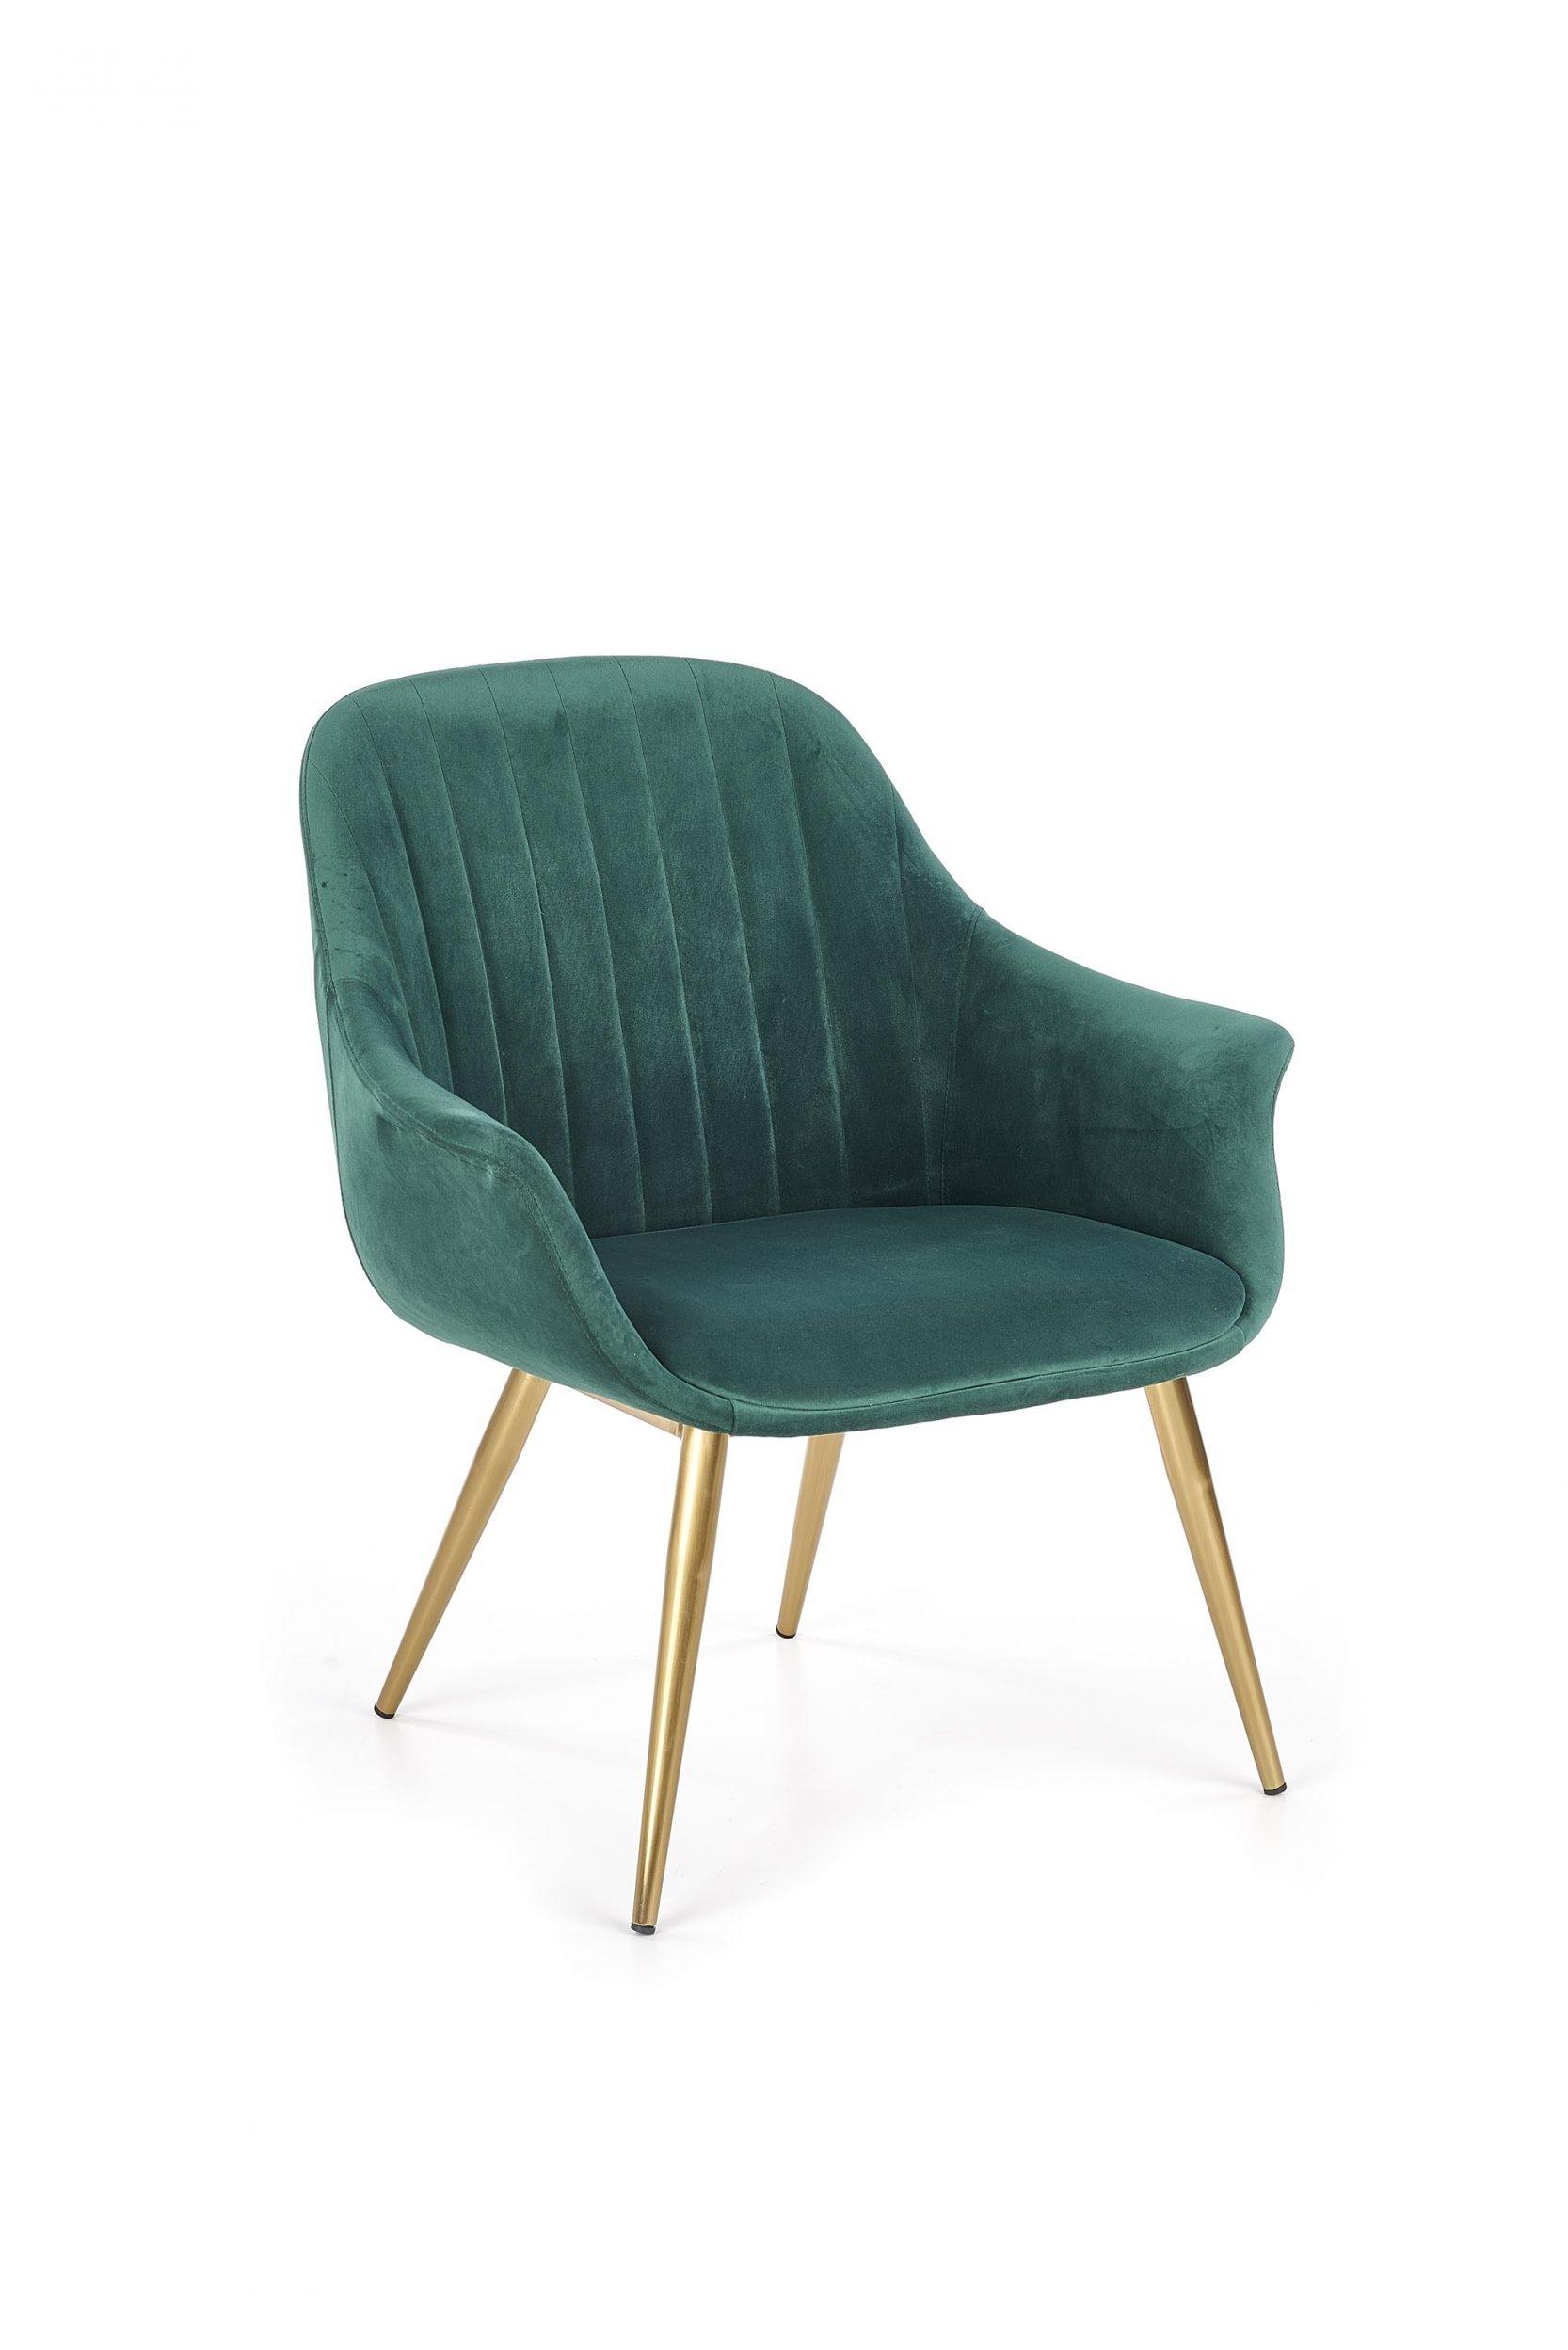 Fotoliu fix tapitat cu stofa cu picioare din metal Elegance 2 Dark Green / Gold l72xA60xH79 cm